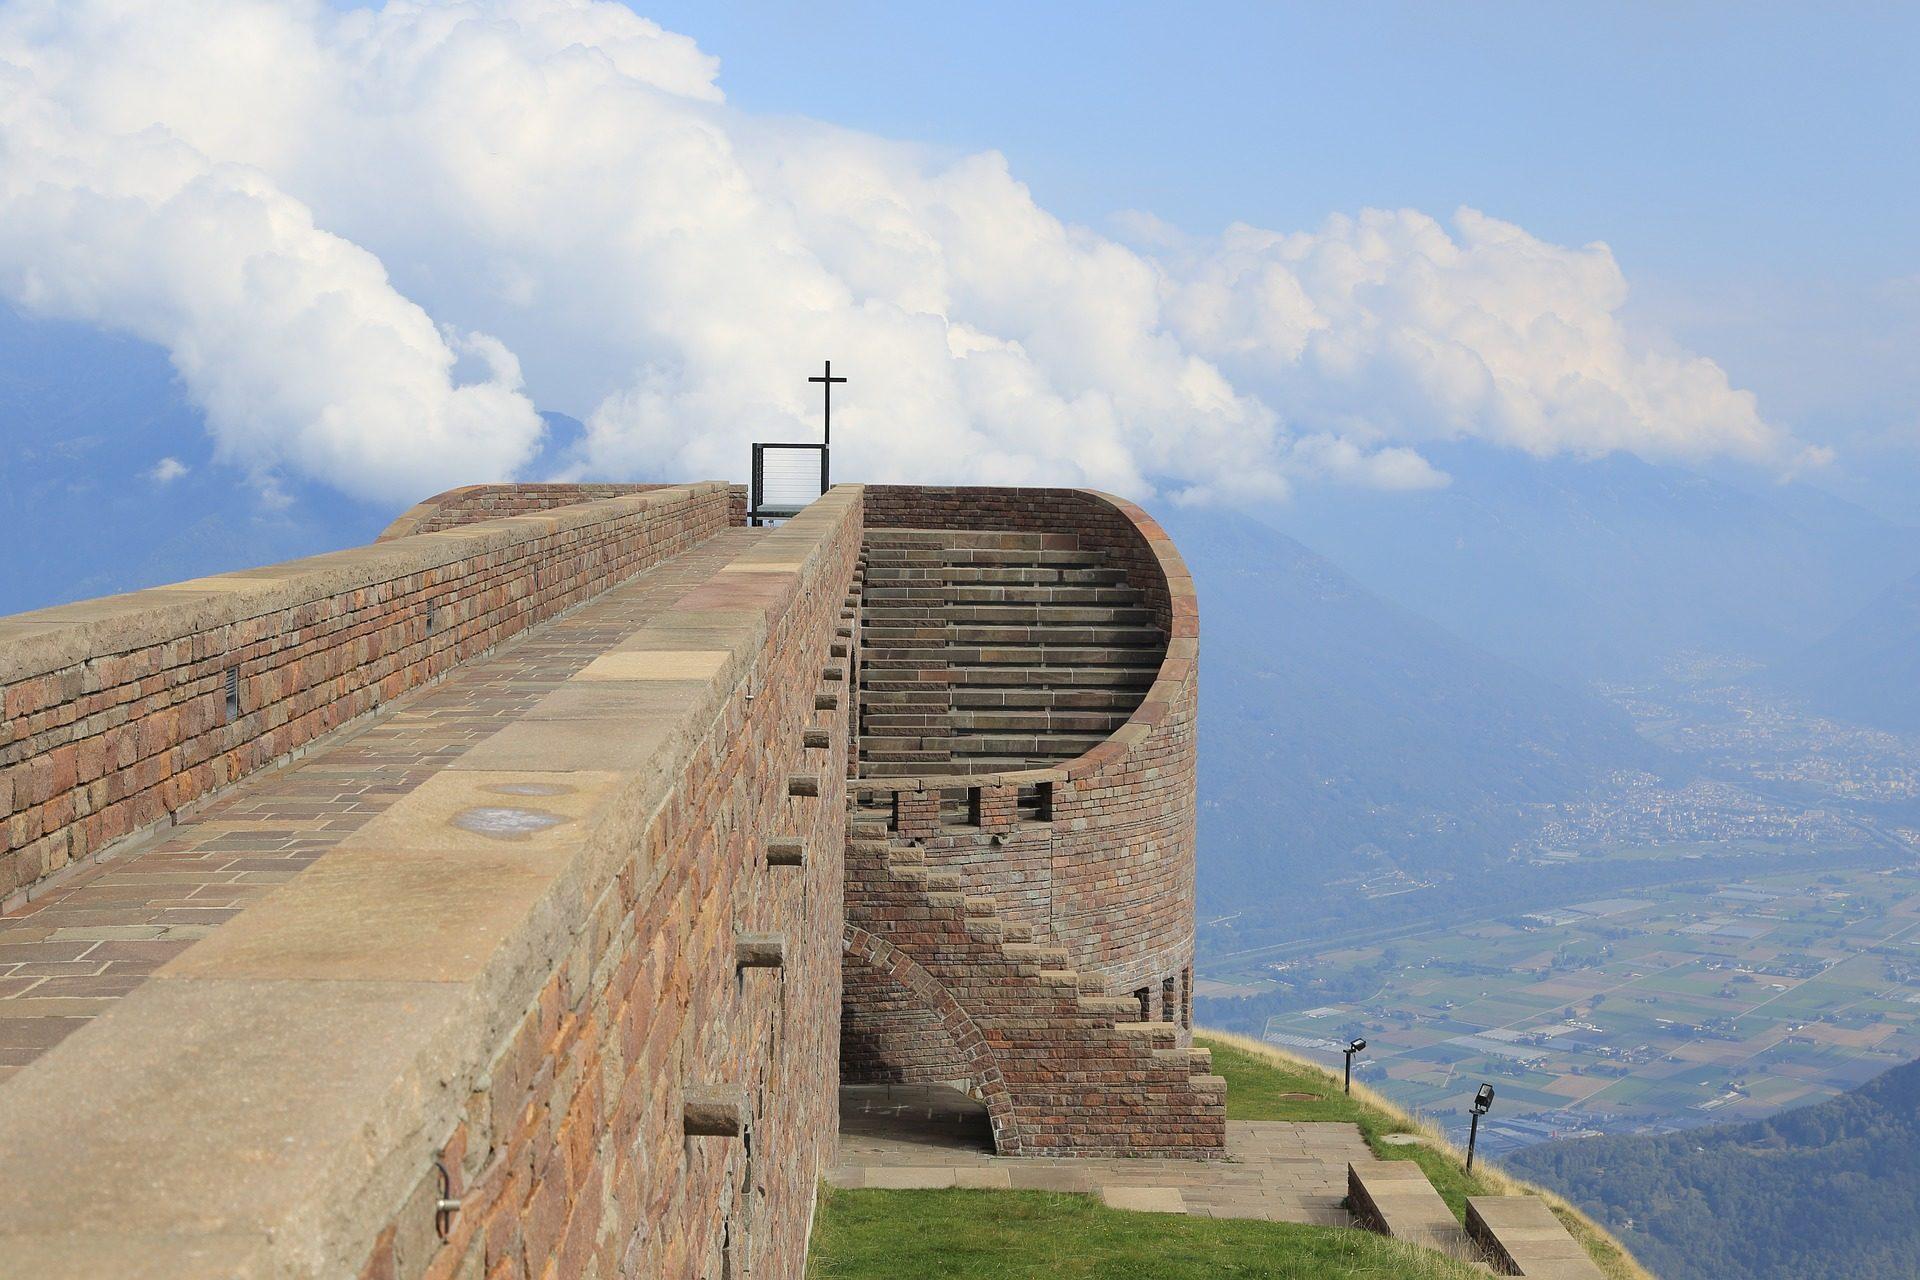 edificio, monte, tamaro, iglesia, arquitectura, altitud - Fondos de Pantalla HD - professor-falken.com